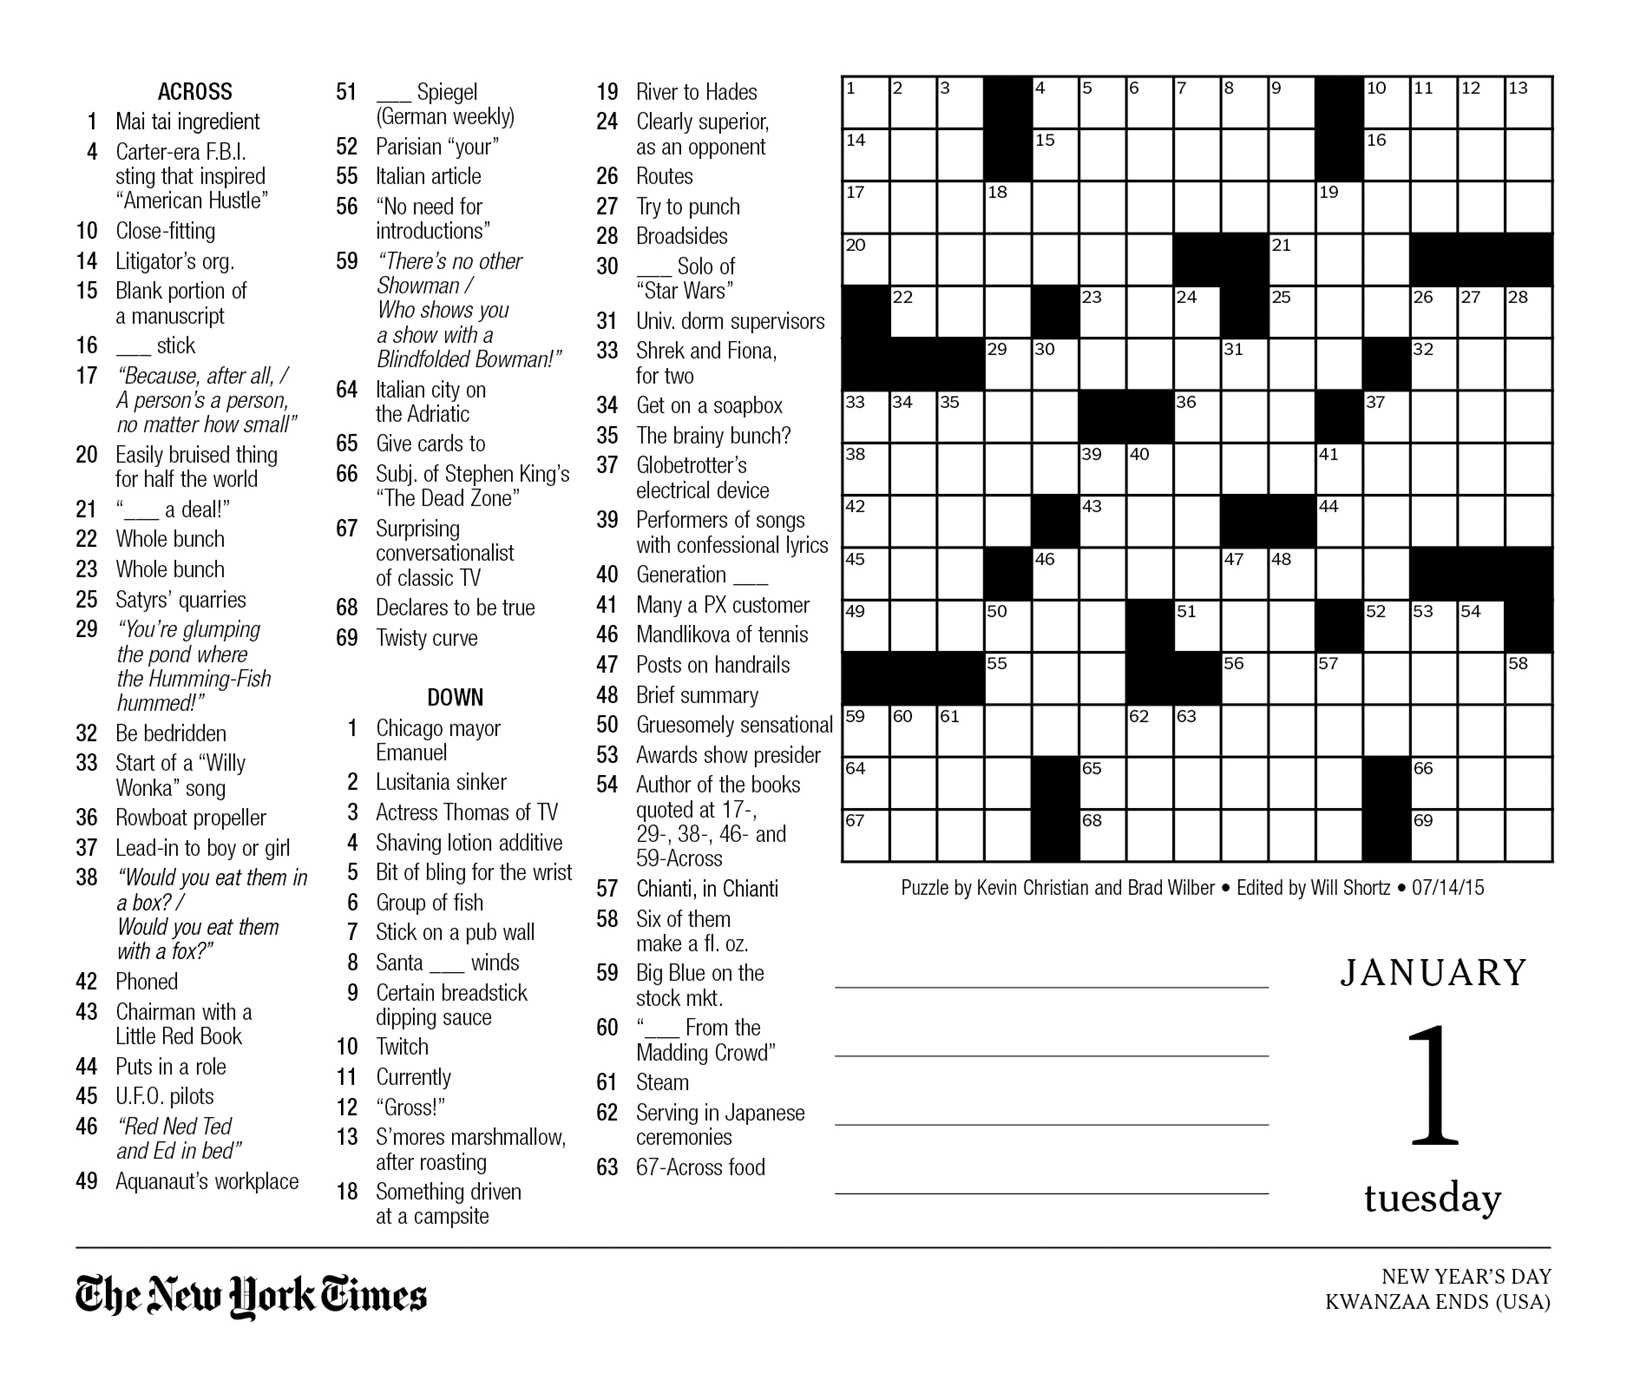 Free Nyt Crossword Puzzles Printable